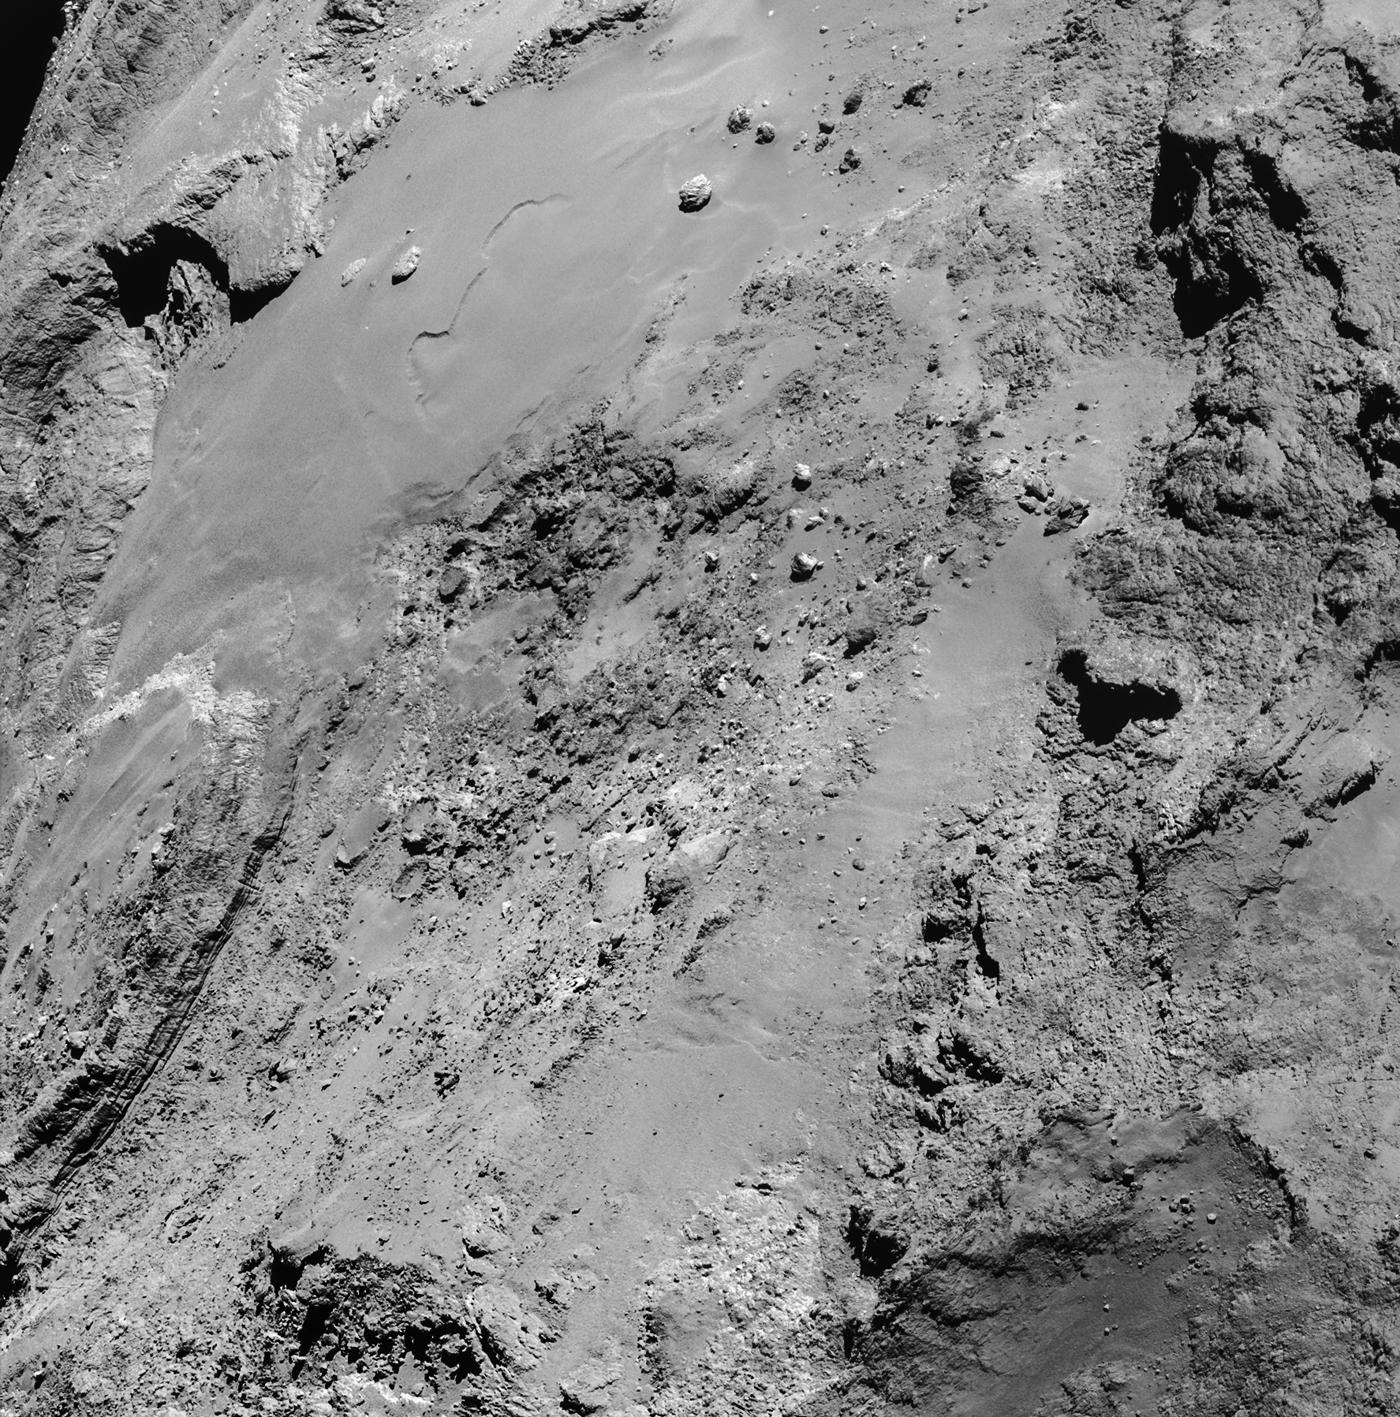 Rosetta view of Comet Churyumov-Gerasimenko on February 14, 2015